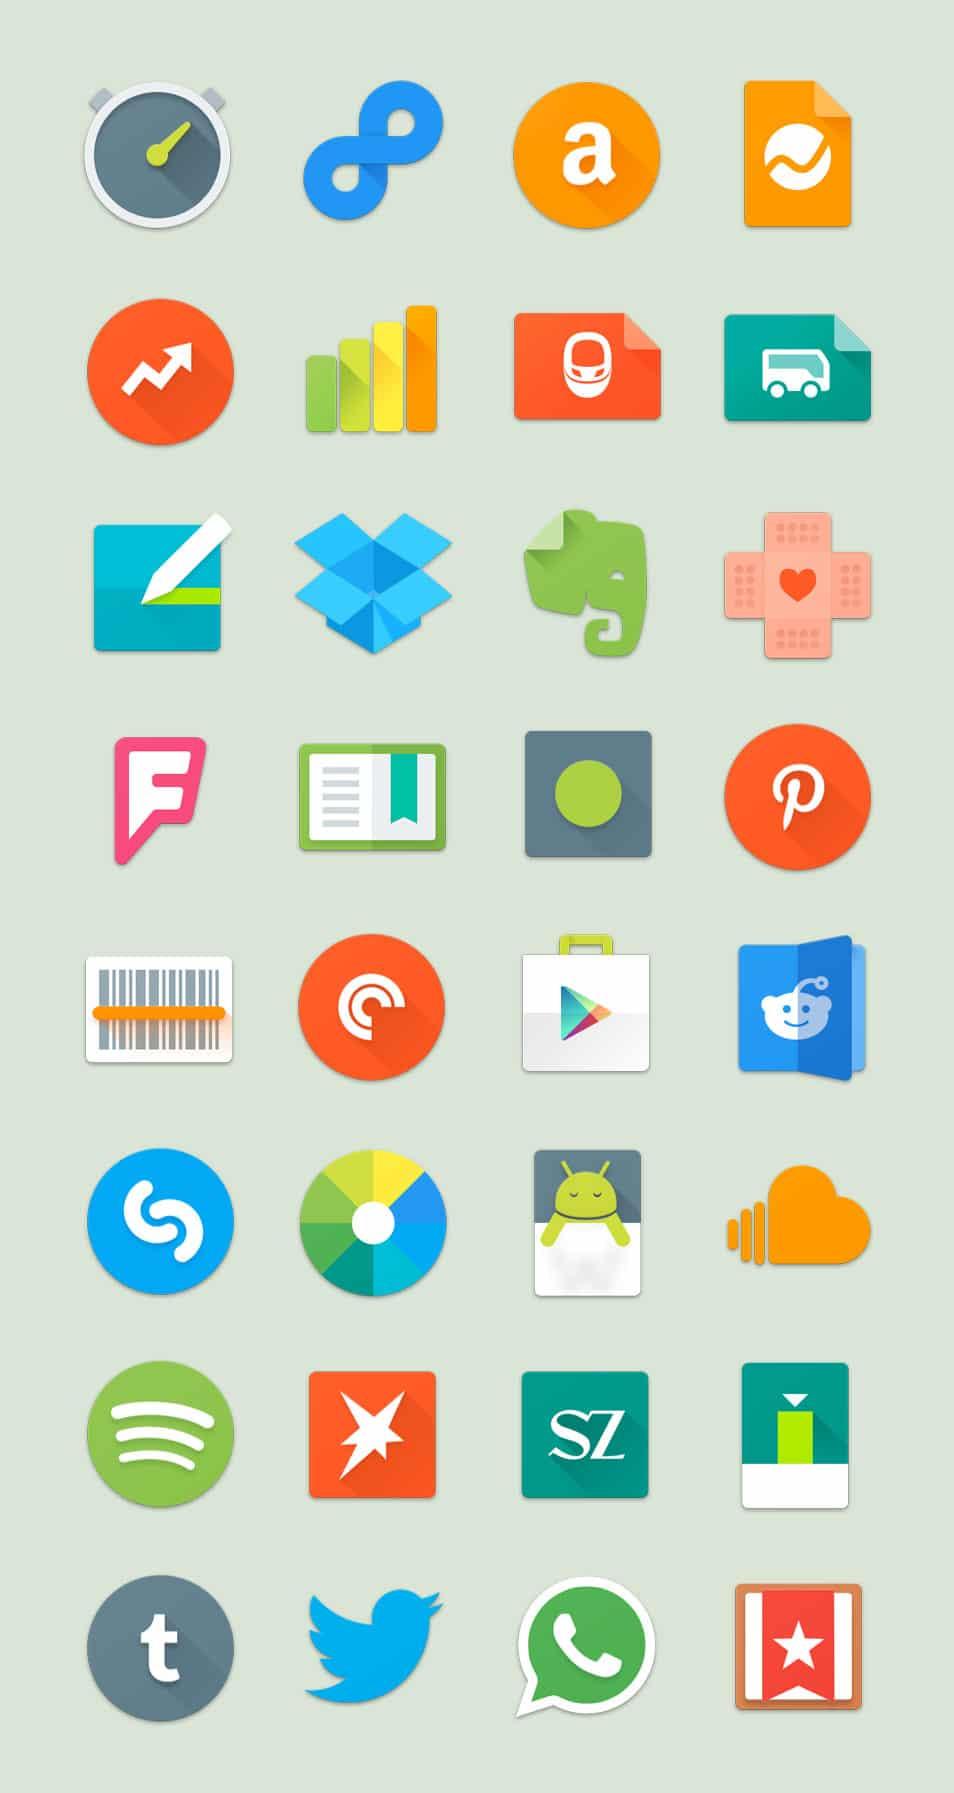 Android Lollipop Icon Set